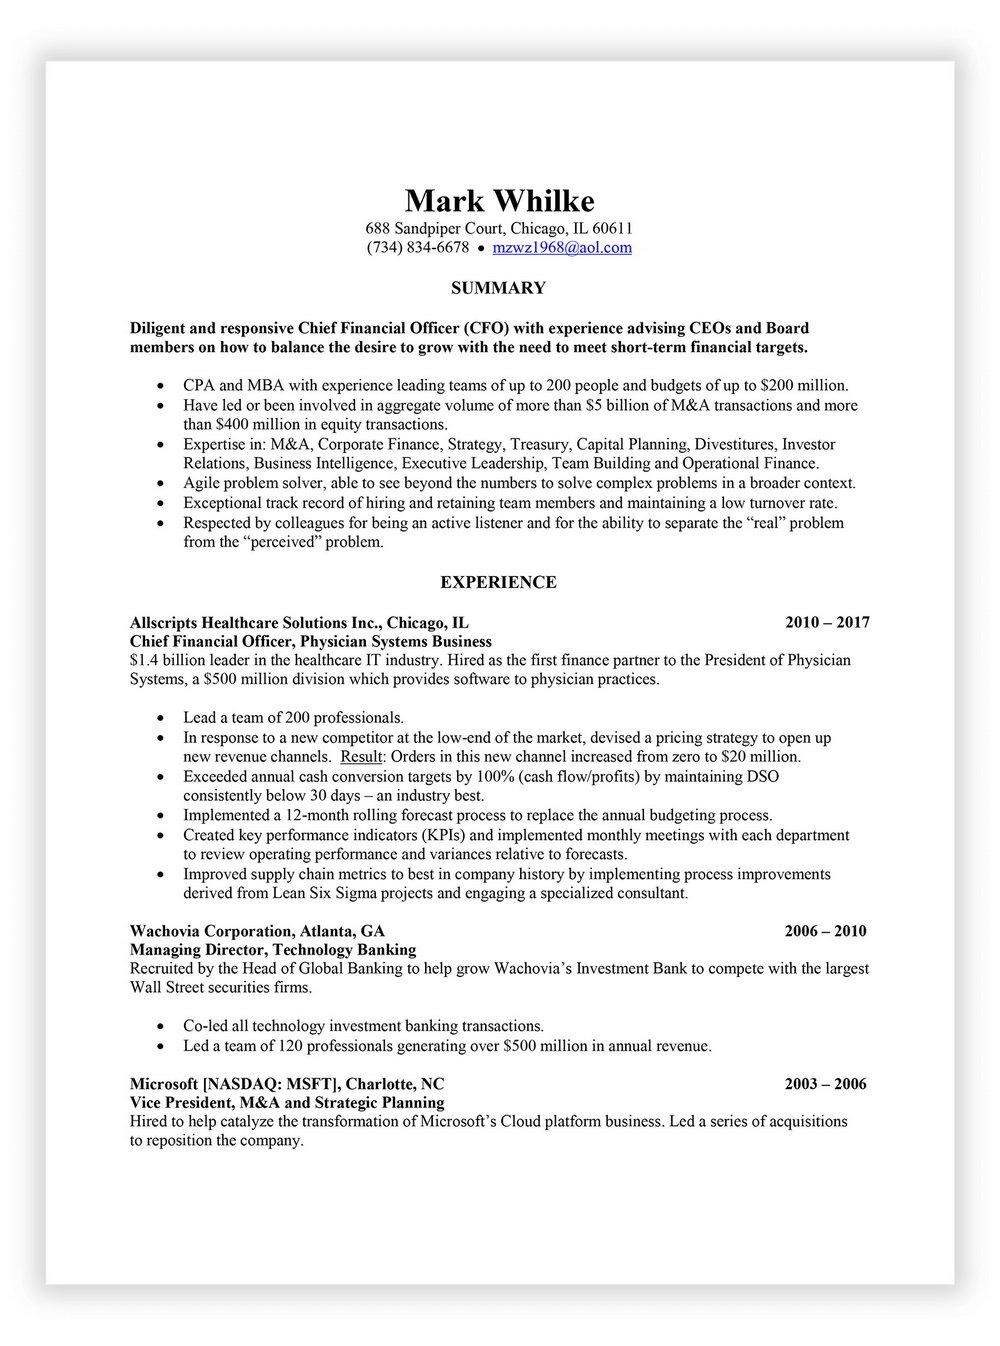 Resume Writing Service Charlotte Nc